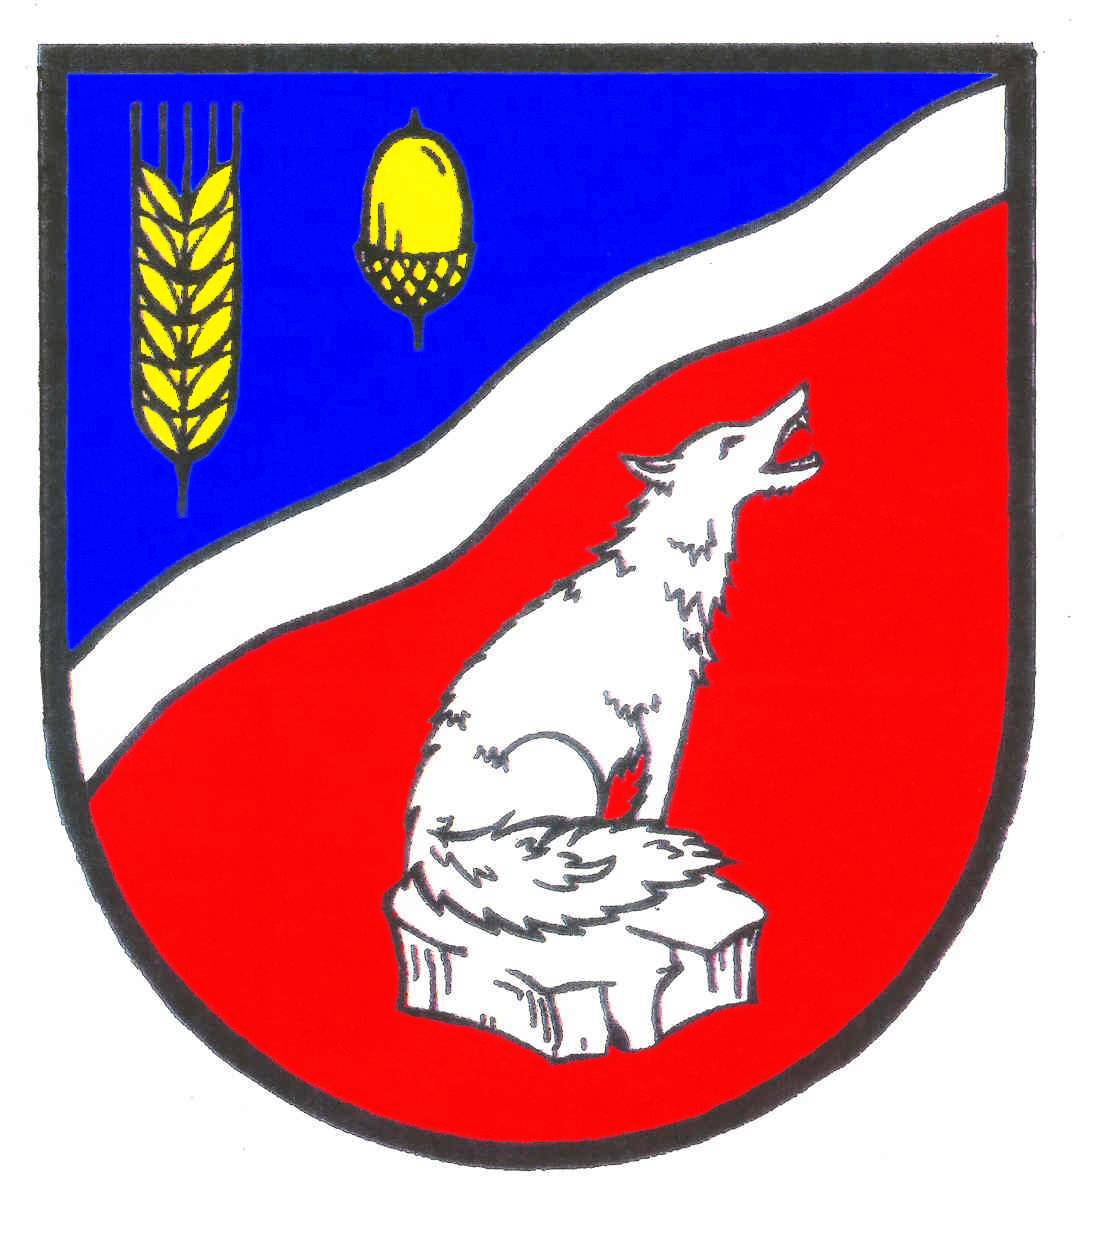 Wappen GemeindeKummerfeld, Kreis Pinneberg